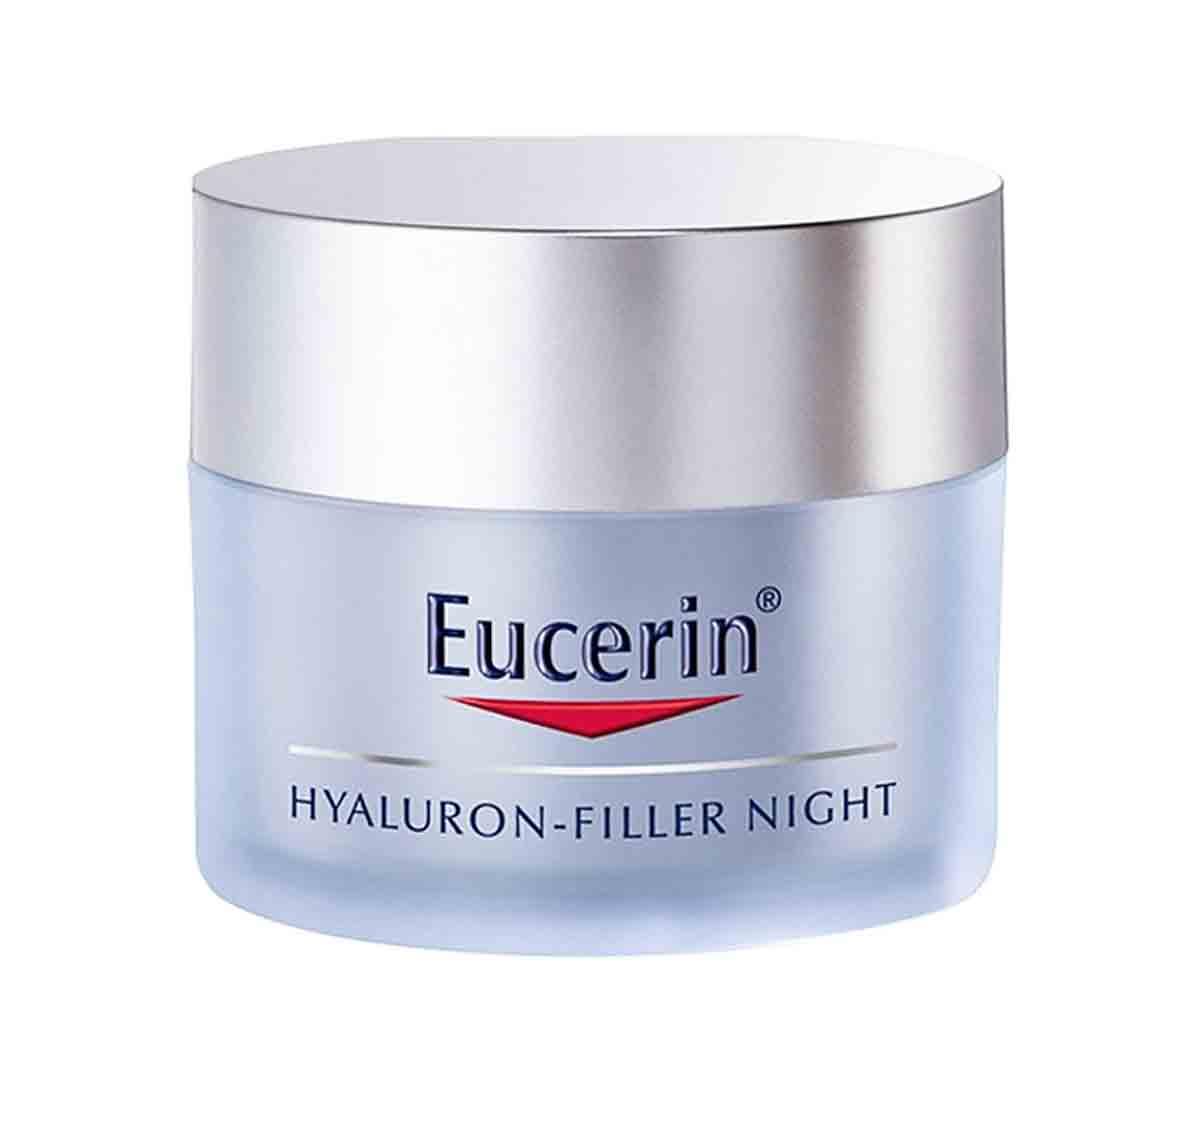 کرم شب اوسرین مدل Hyaluron Filler : ضد چروک ۵۰ml